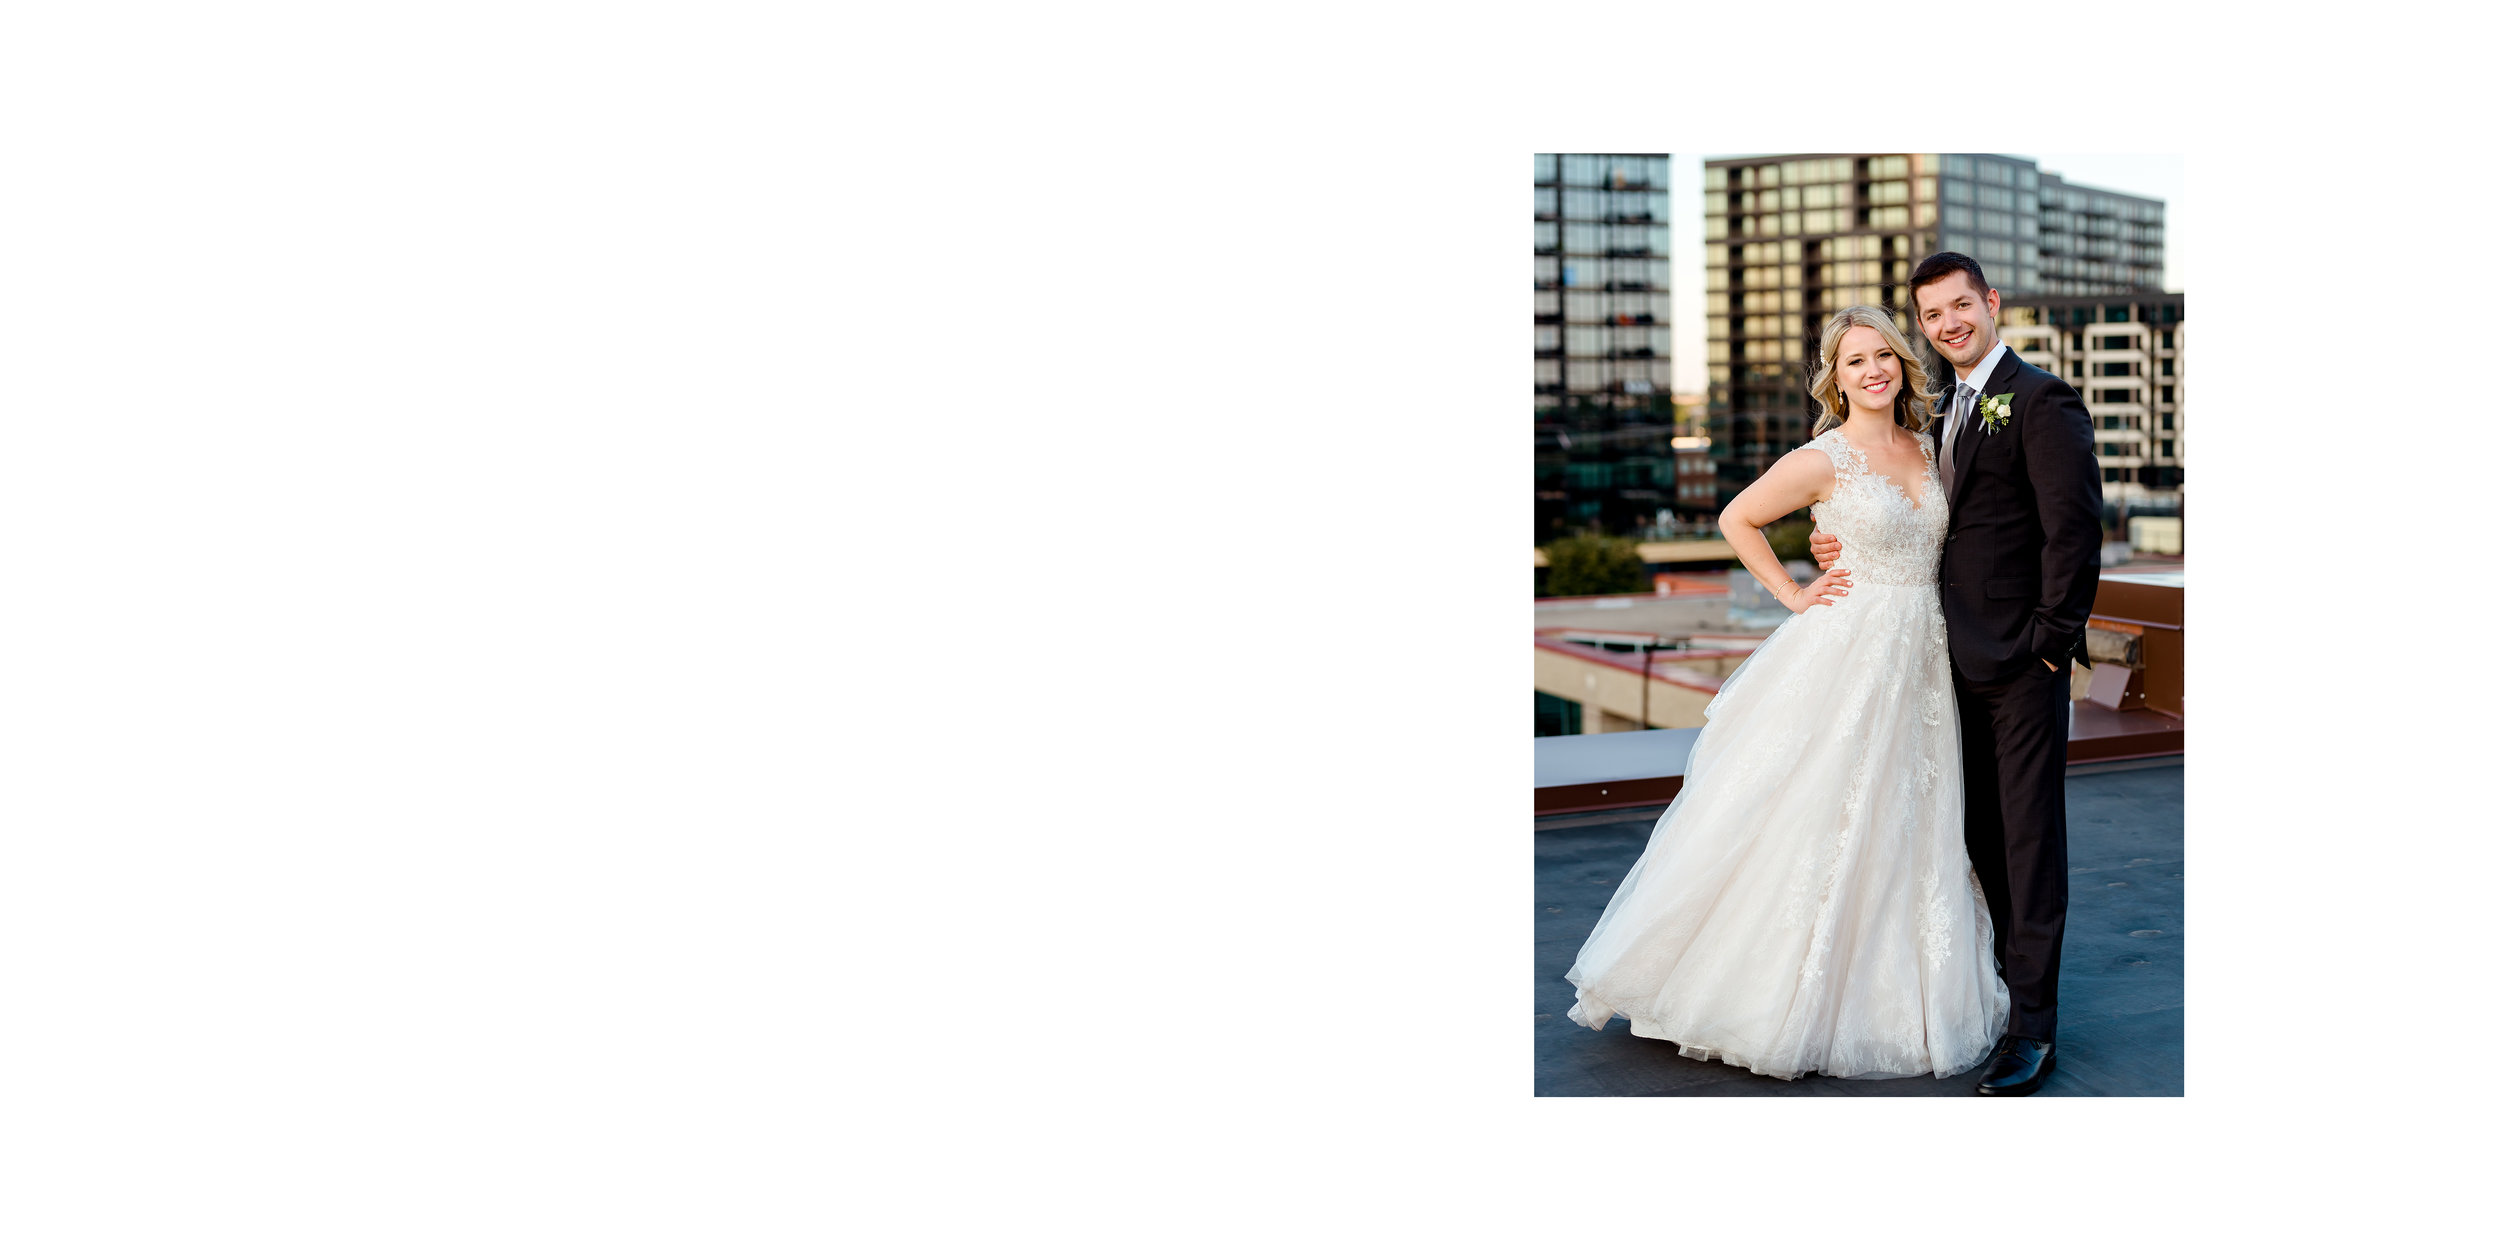 Kristen + Eric - Wedding Album Sample_01.jpg